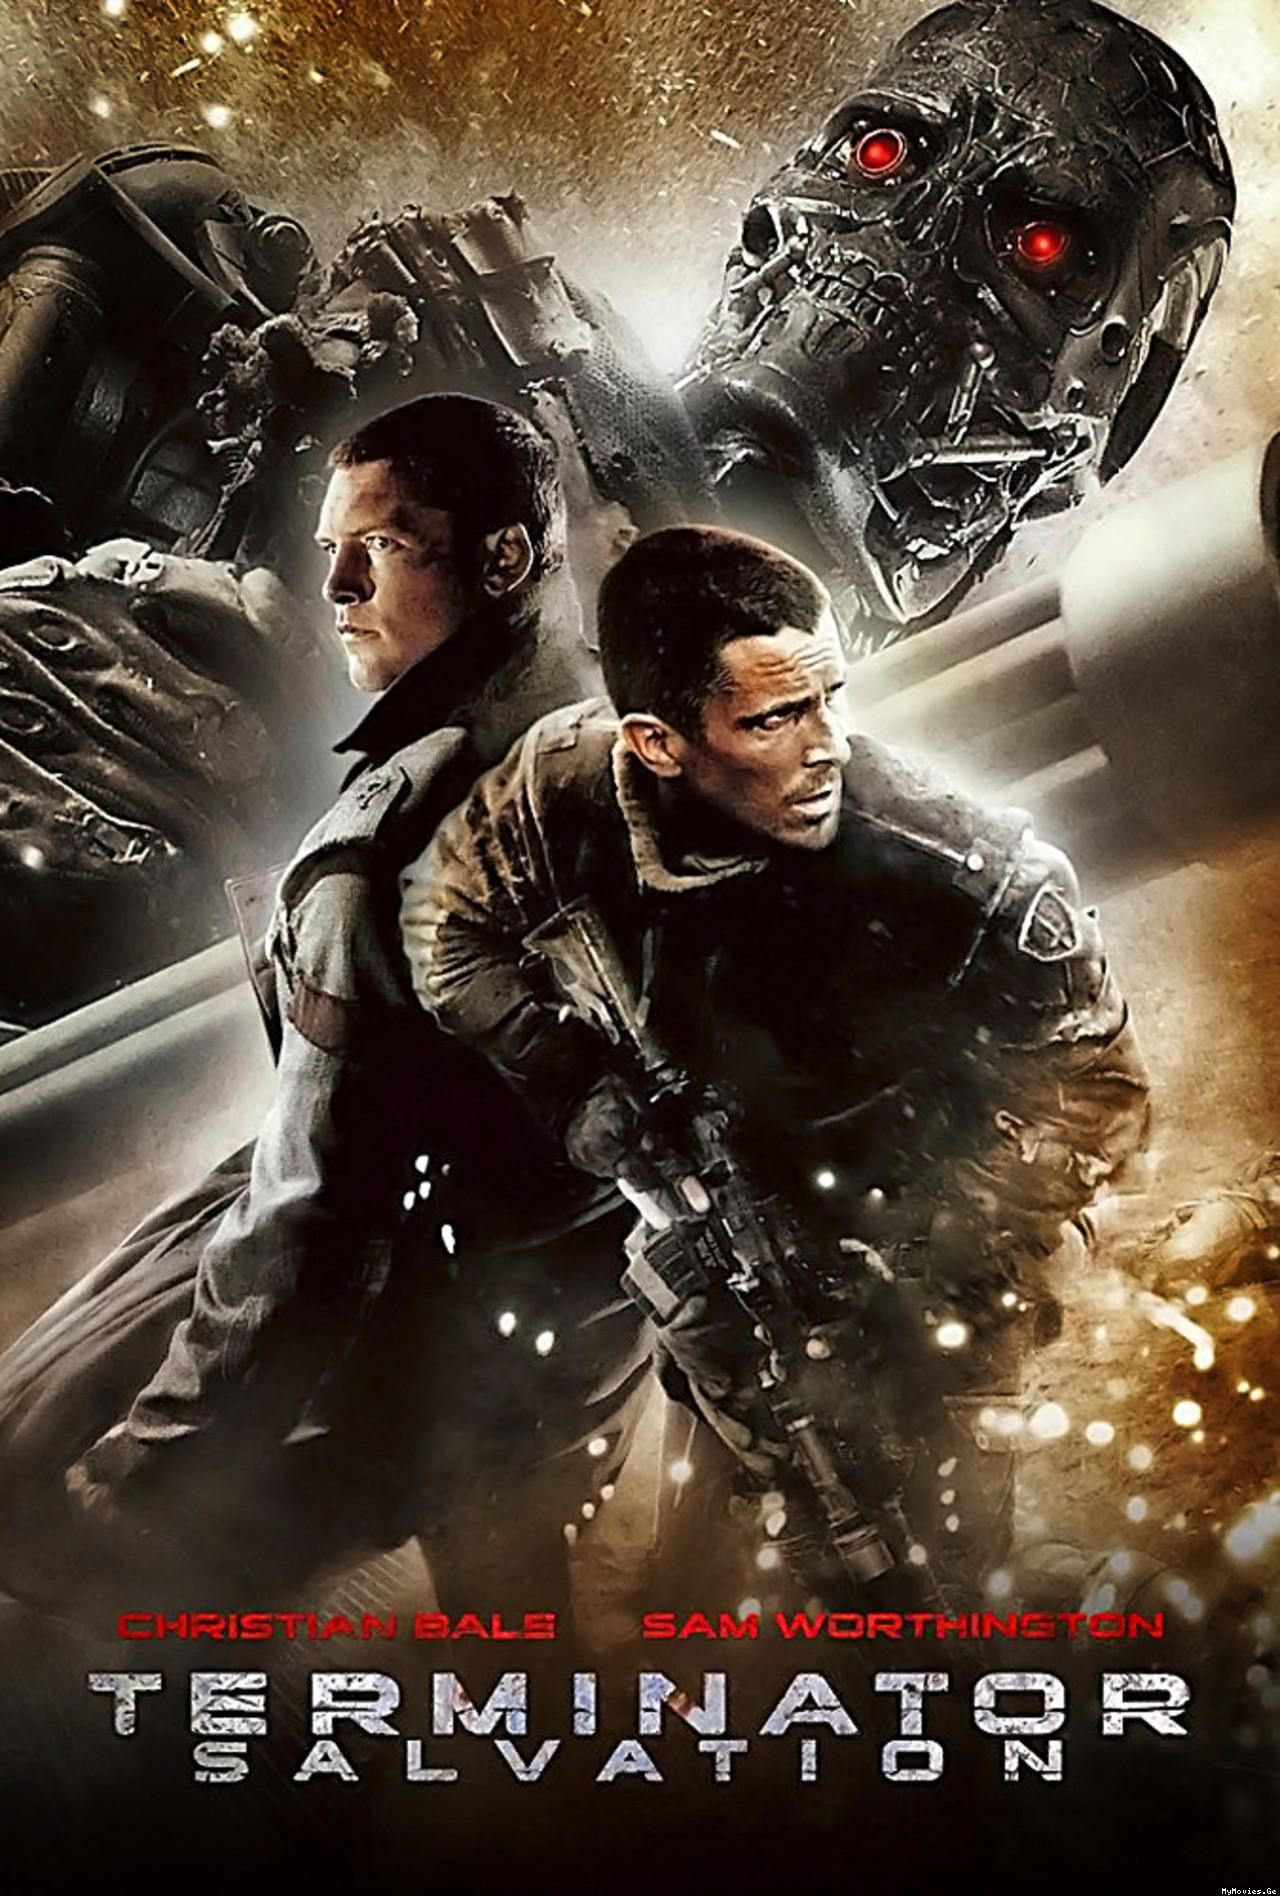 Terminator Salvation Fantascienza Azione Filmes Cartaz De